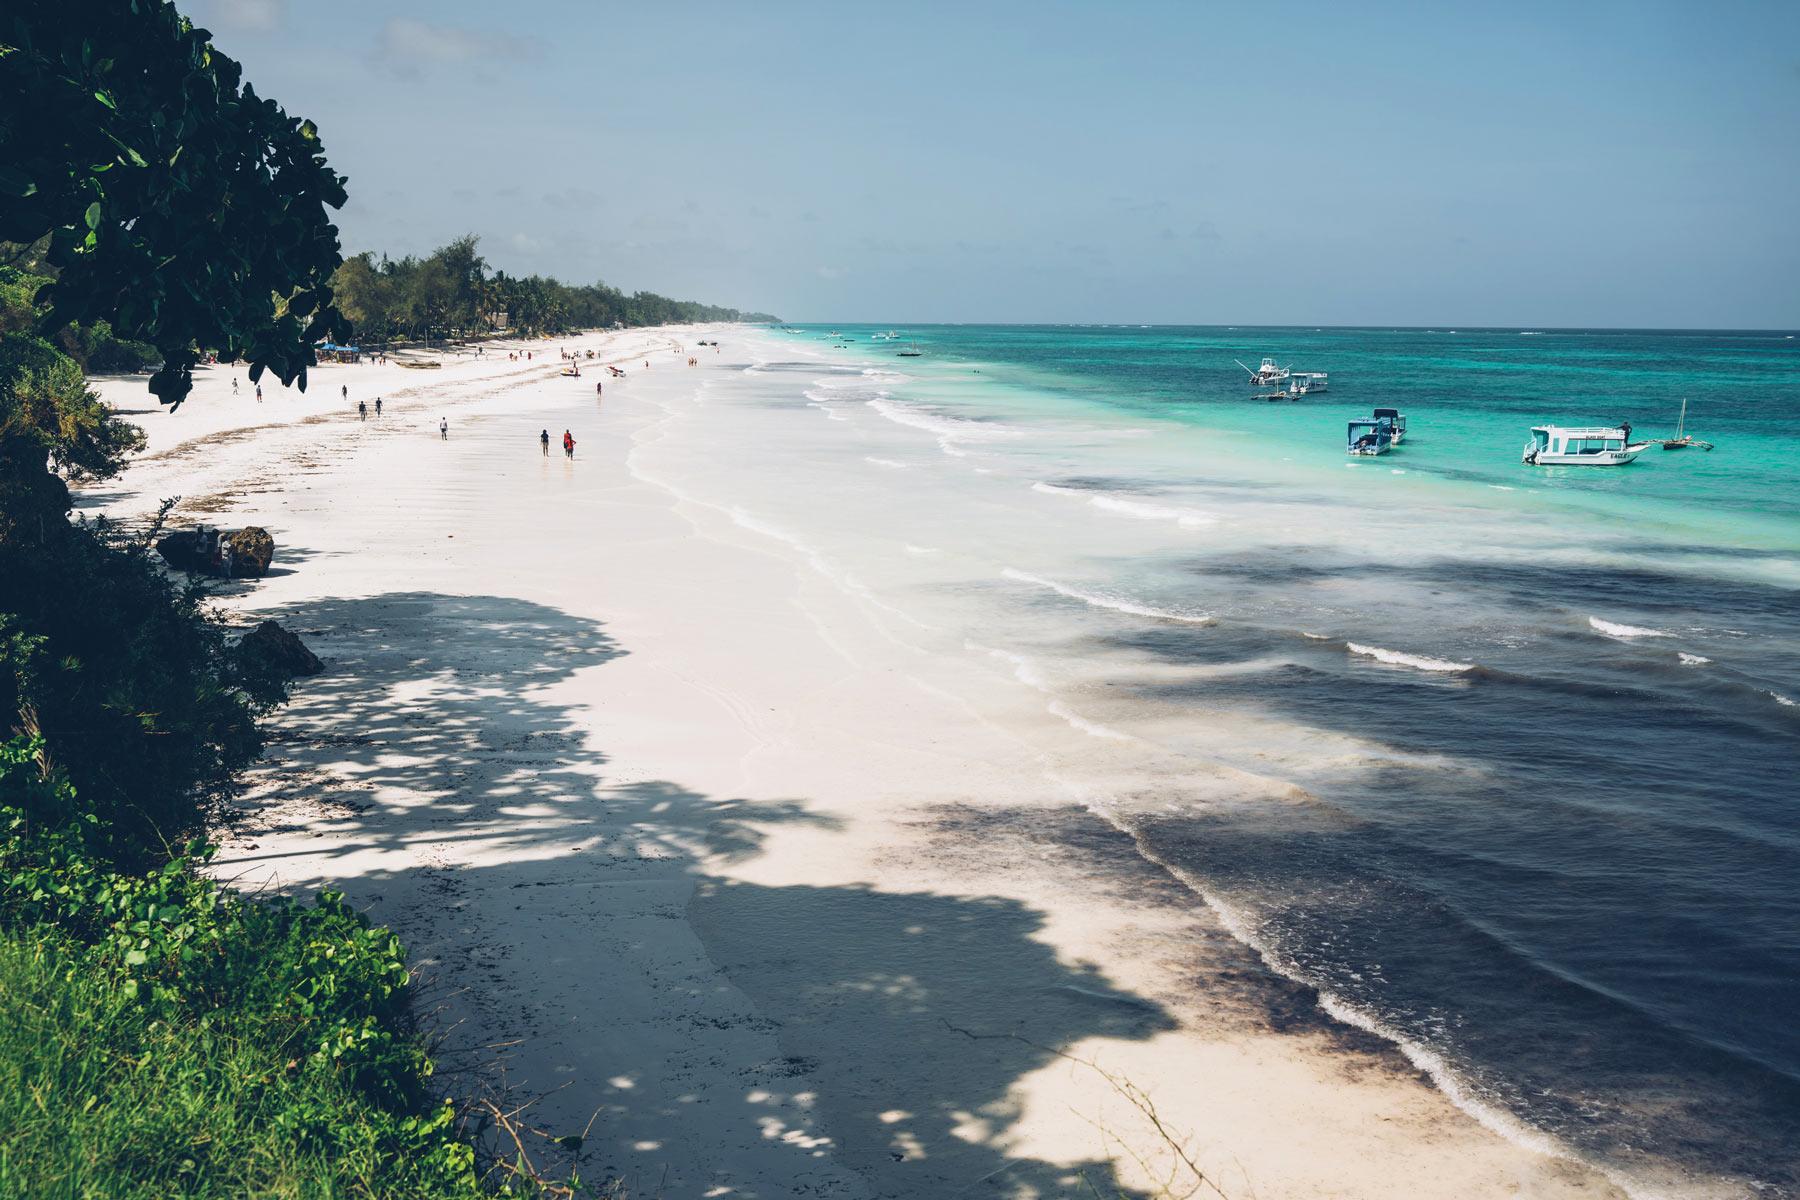 Mombasa, plage de sable blanc au Kenya